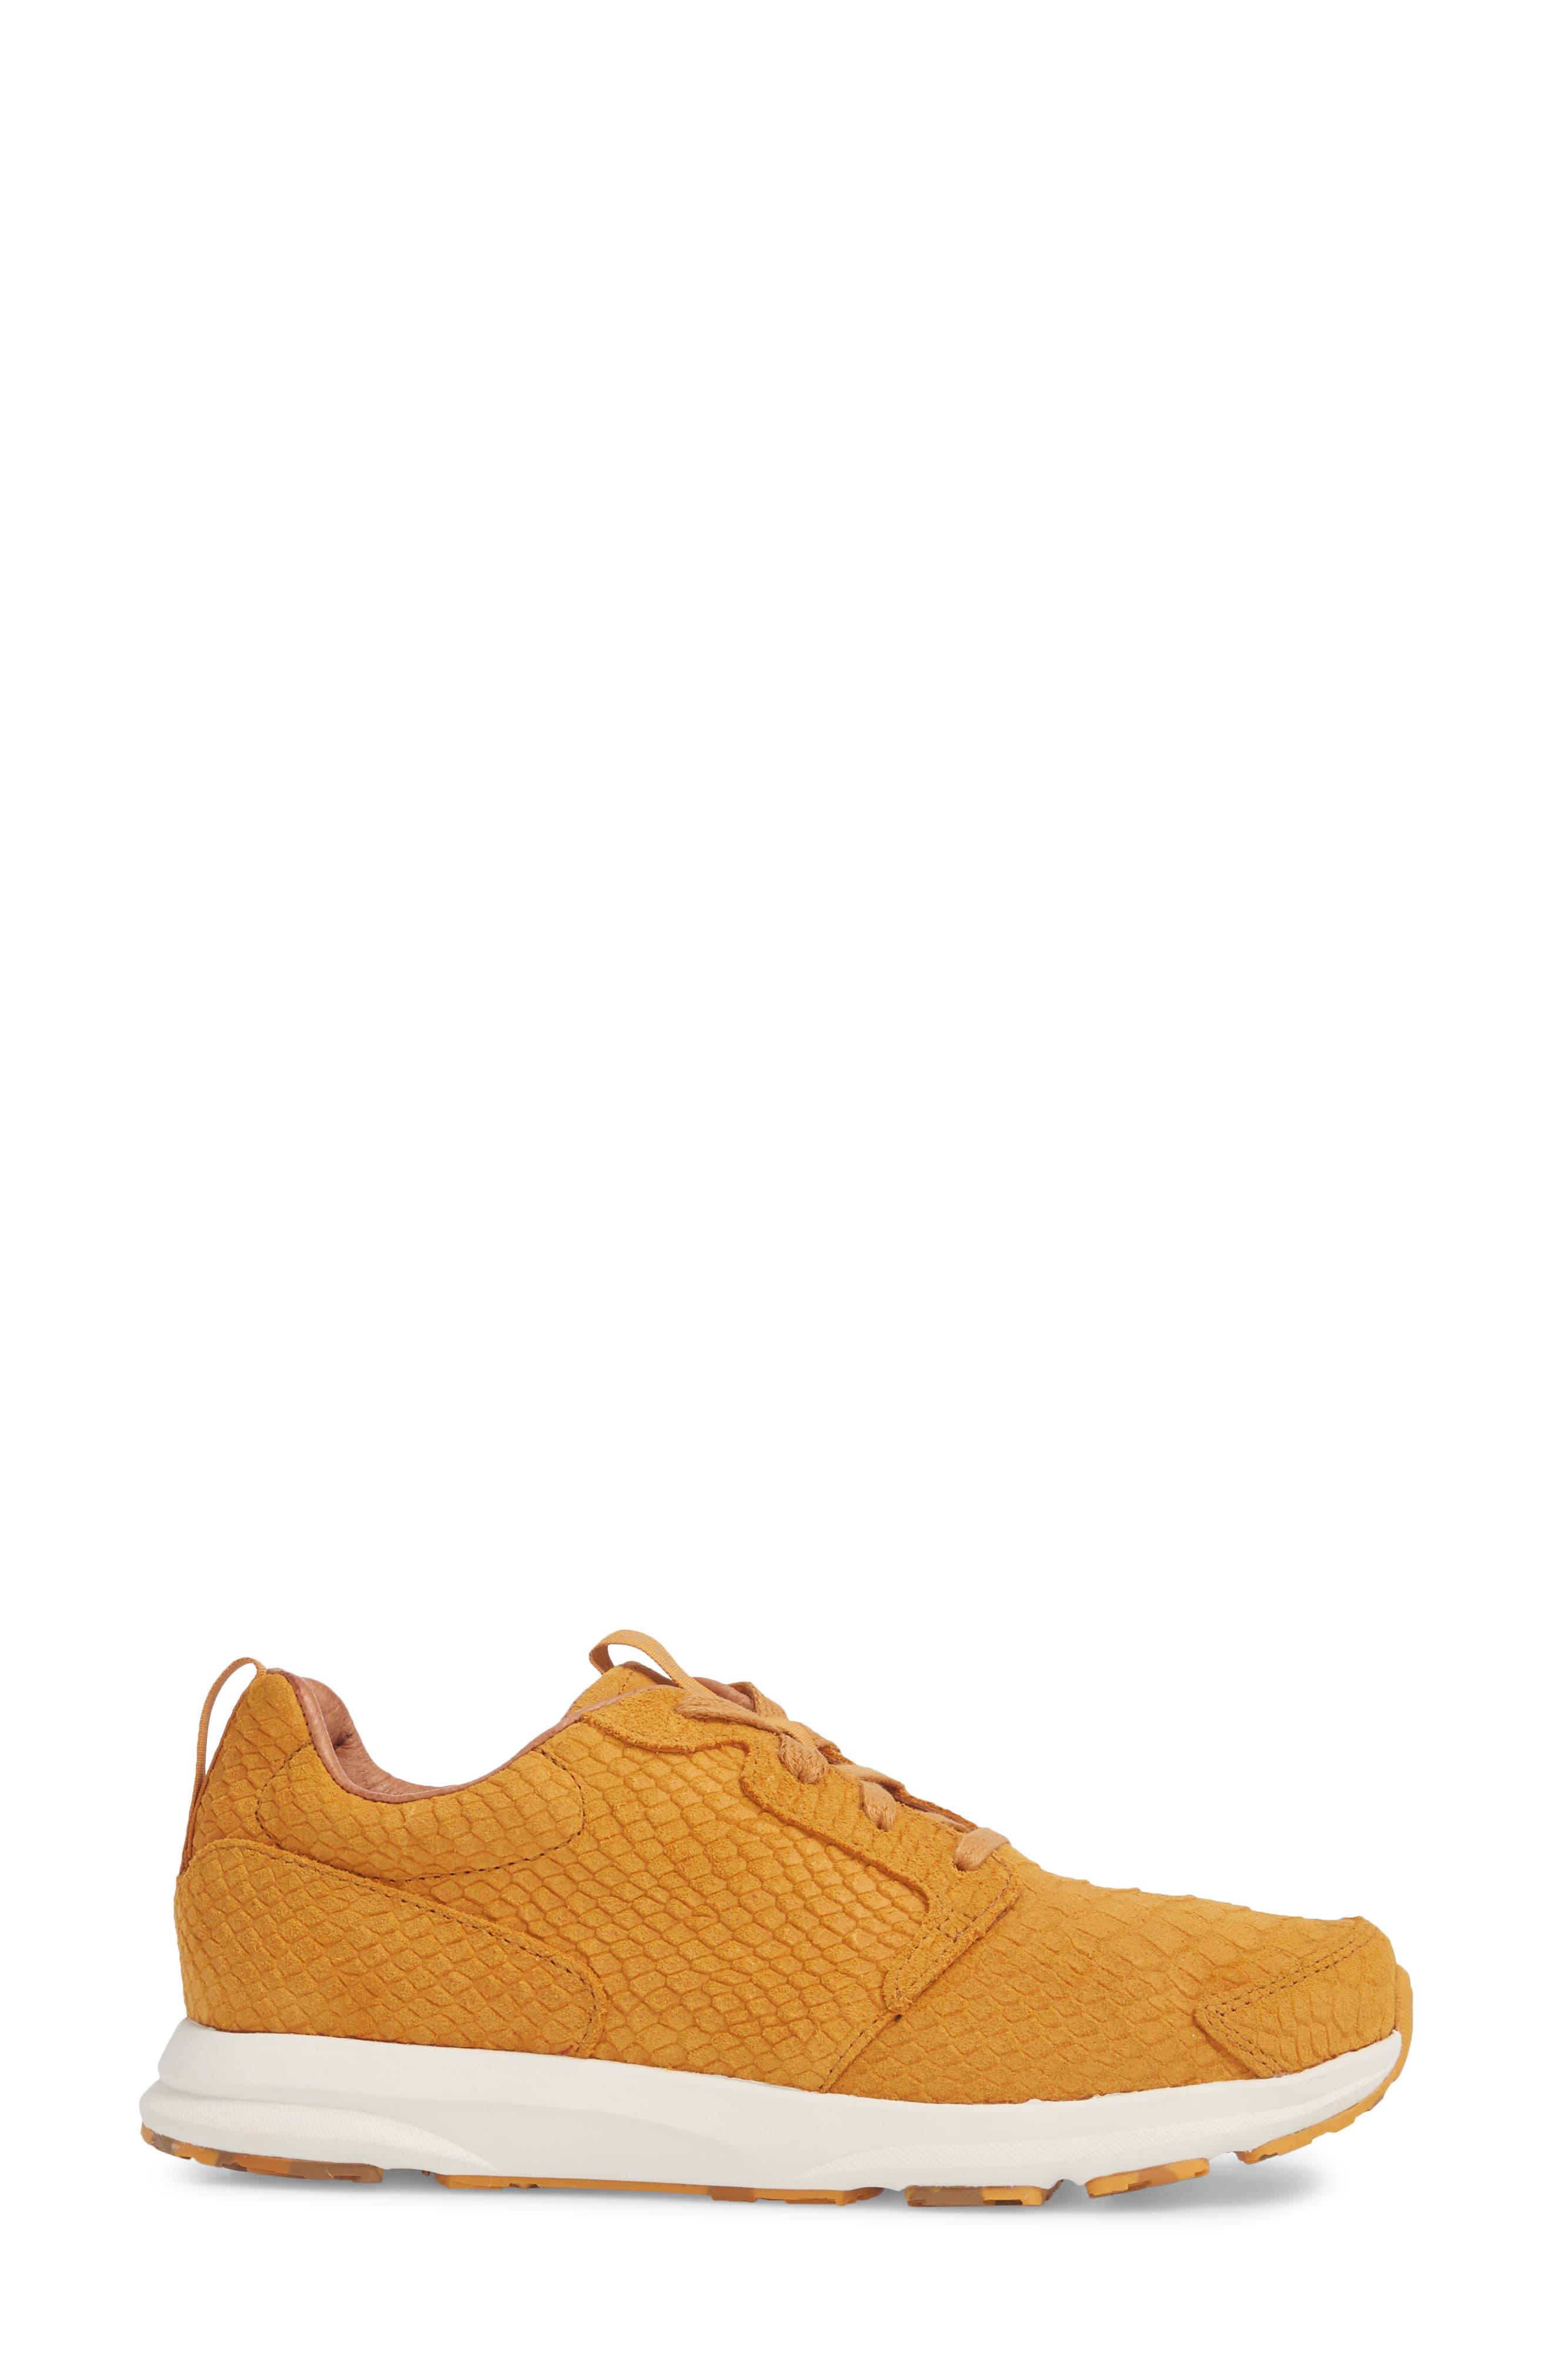 Fusion Sneaker,                             Alternate thumbnail 3, color,                             Fiery Zilla